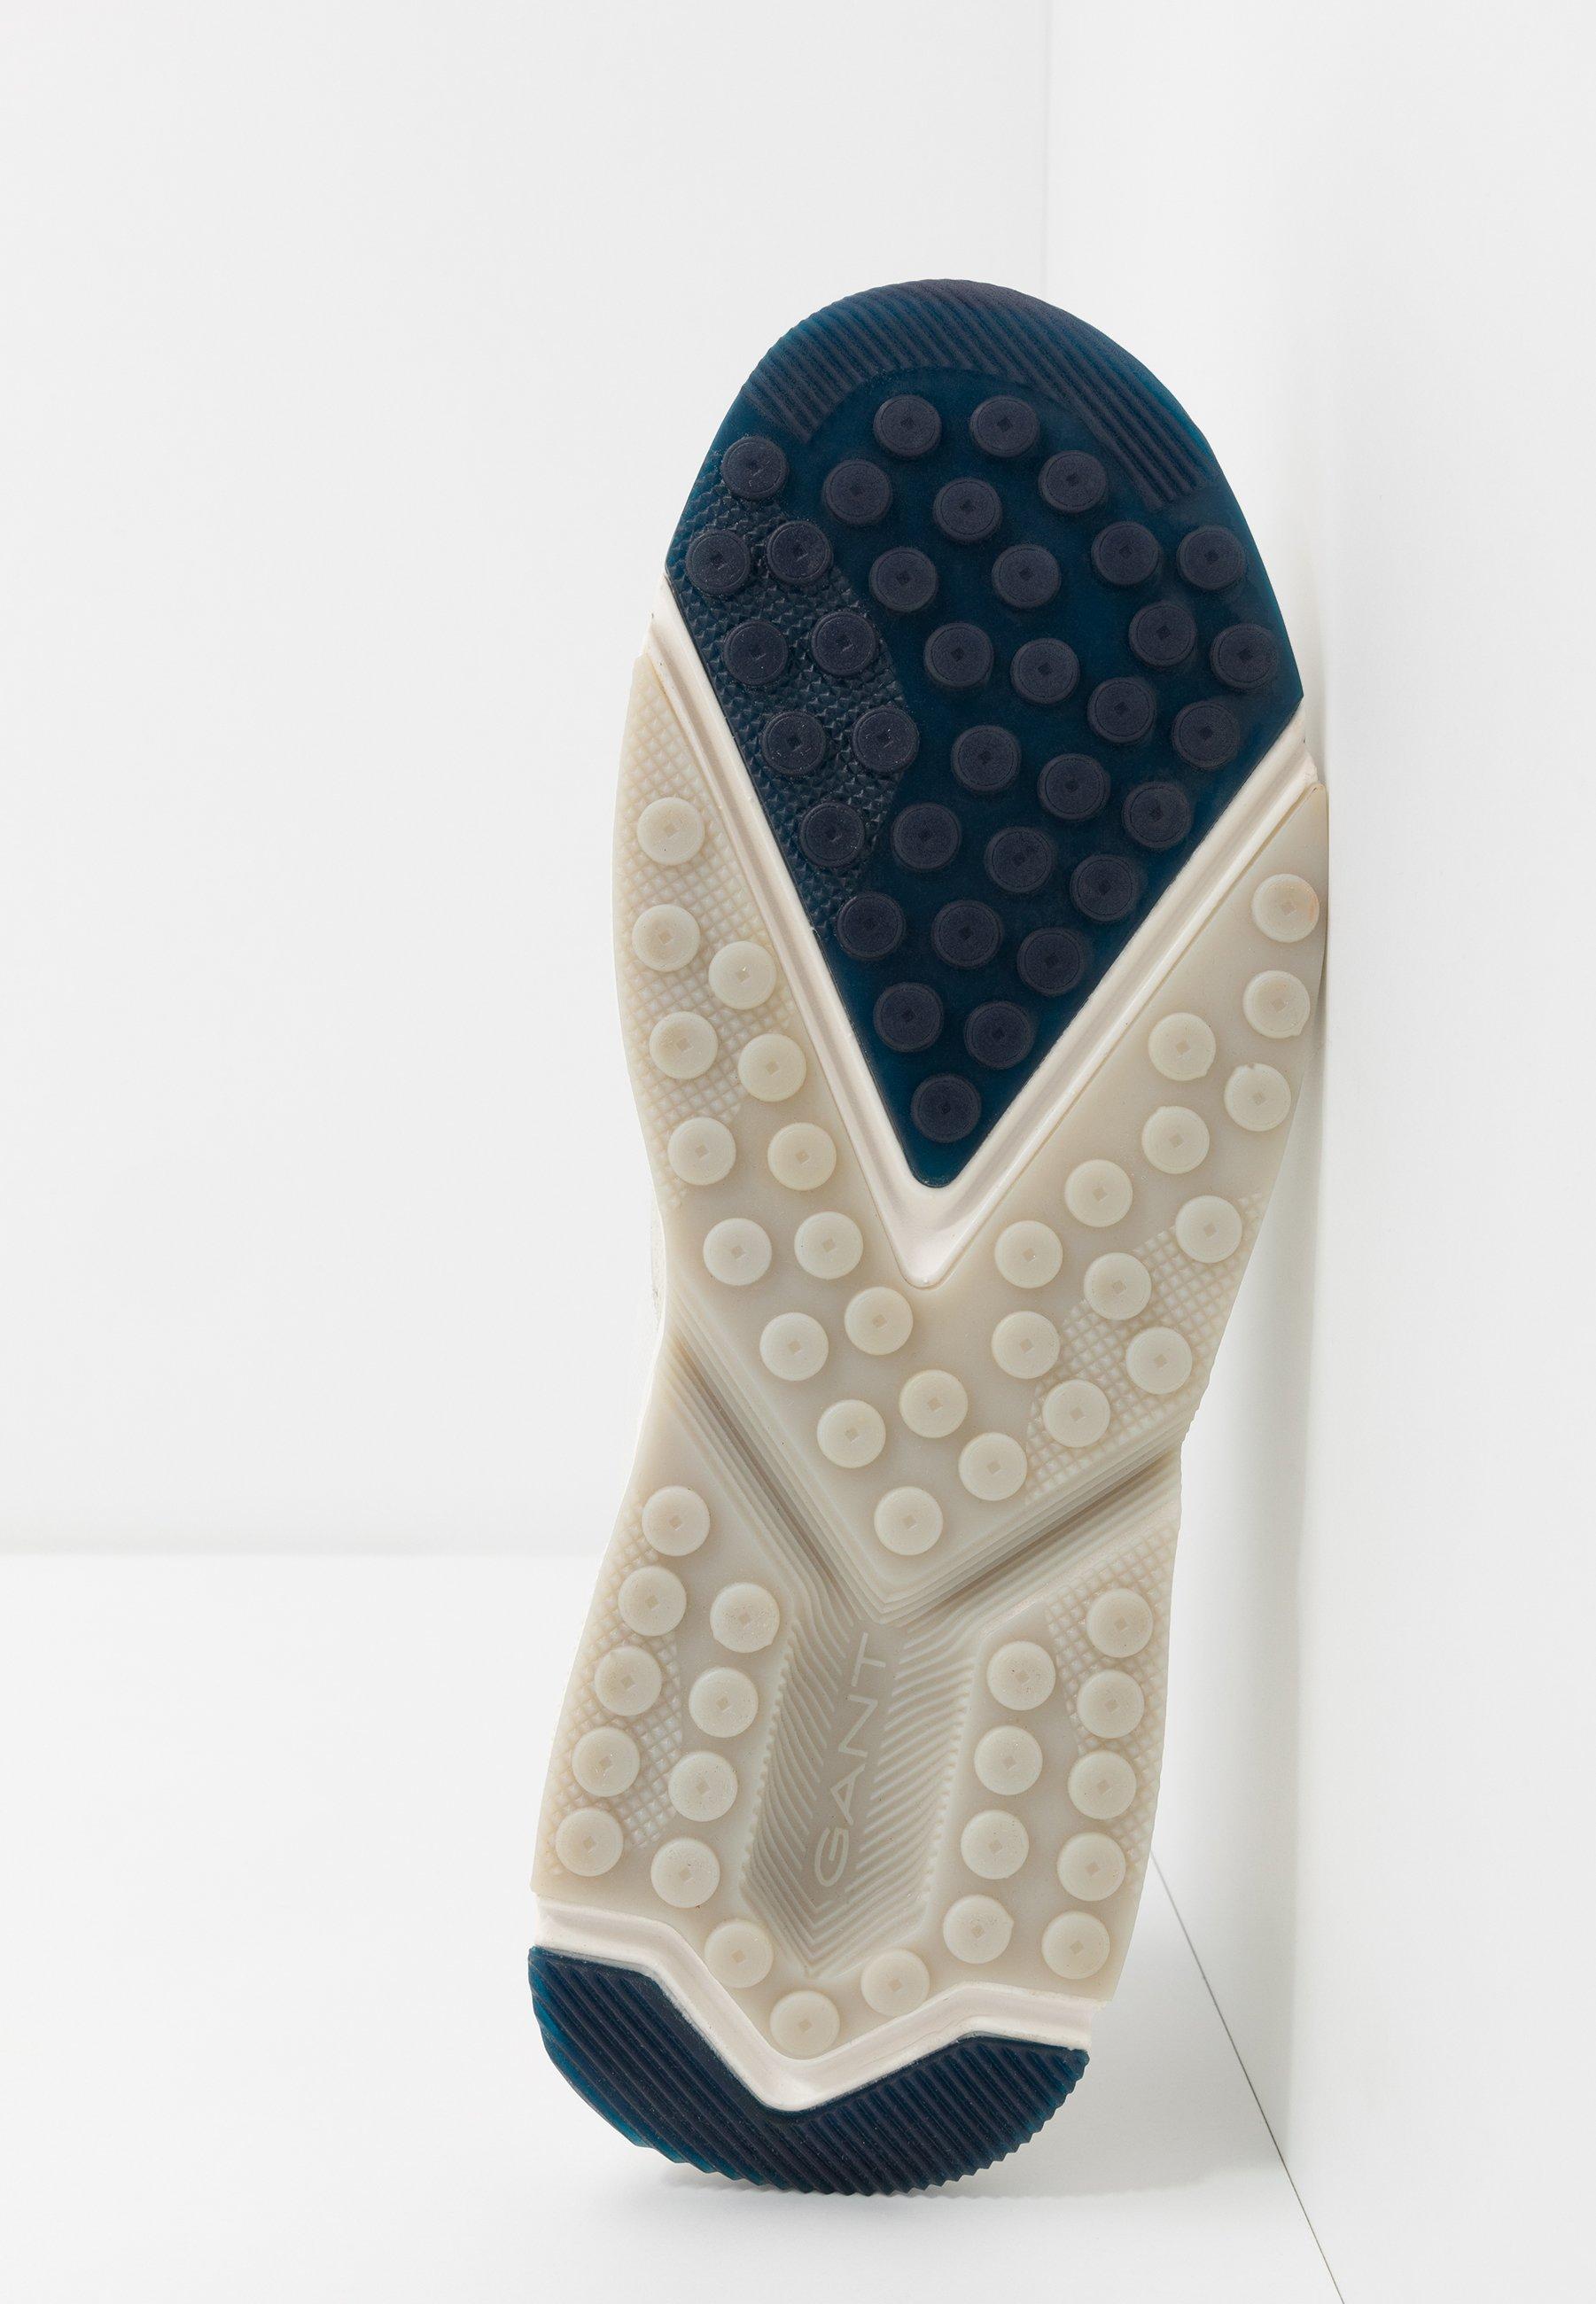 Gant Nicewill - Sneakers Basse Offwhite olC2NDW